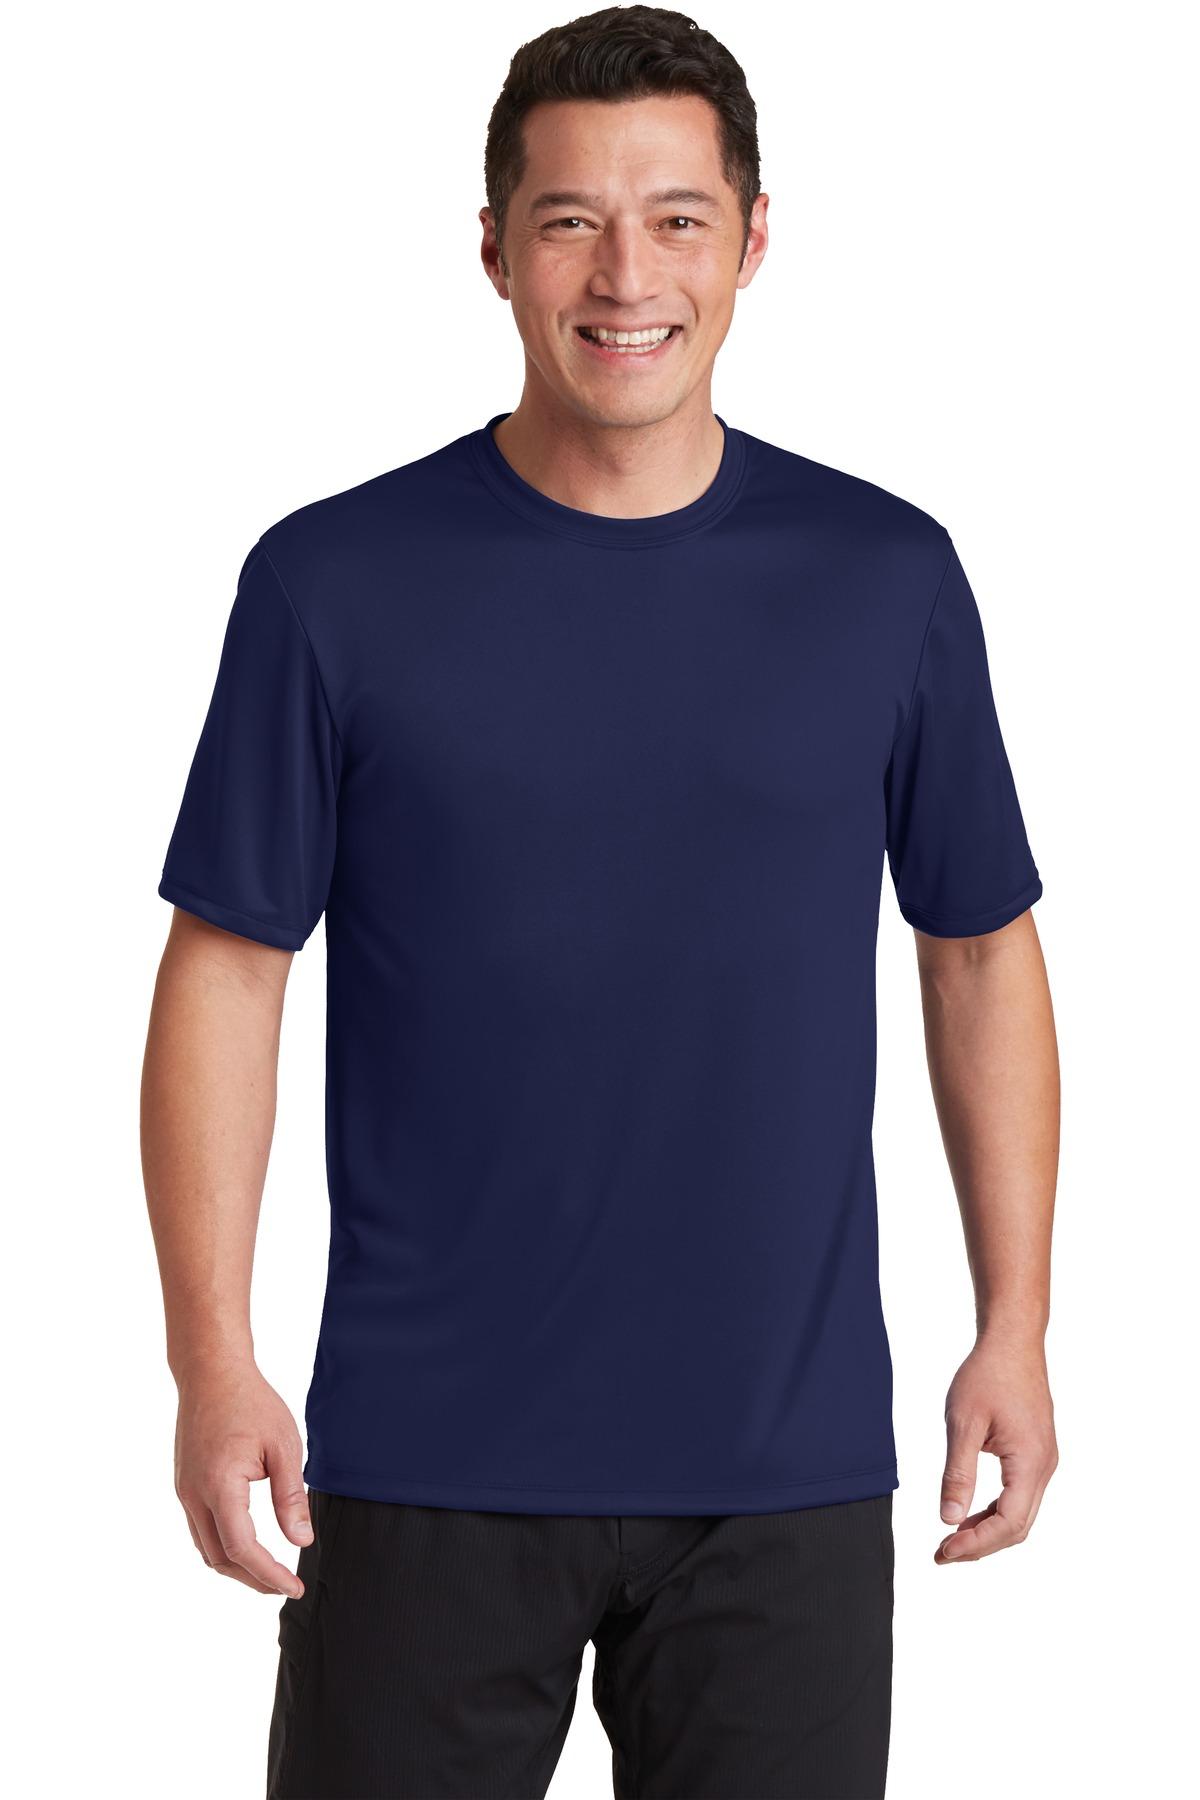 Hanes Cool Dri Performance T-Shirt